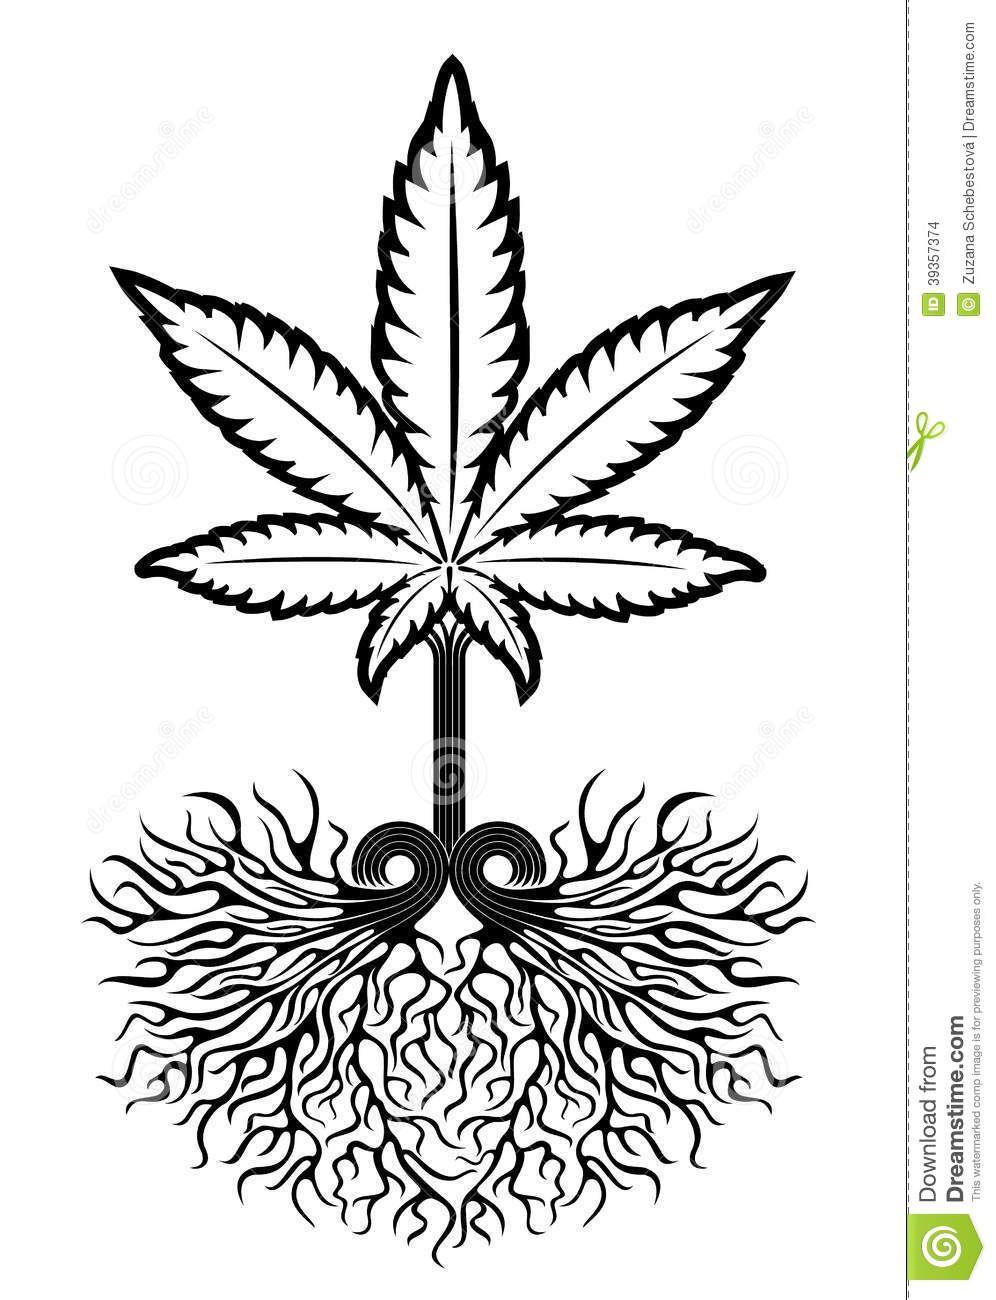 Medical marijuana leaf symbol download from over 37 million high medical marijuana leaf symbol download from over 37 million high quality stock photos images biocorpaavc